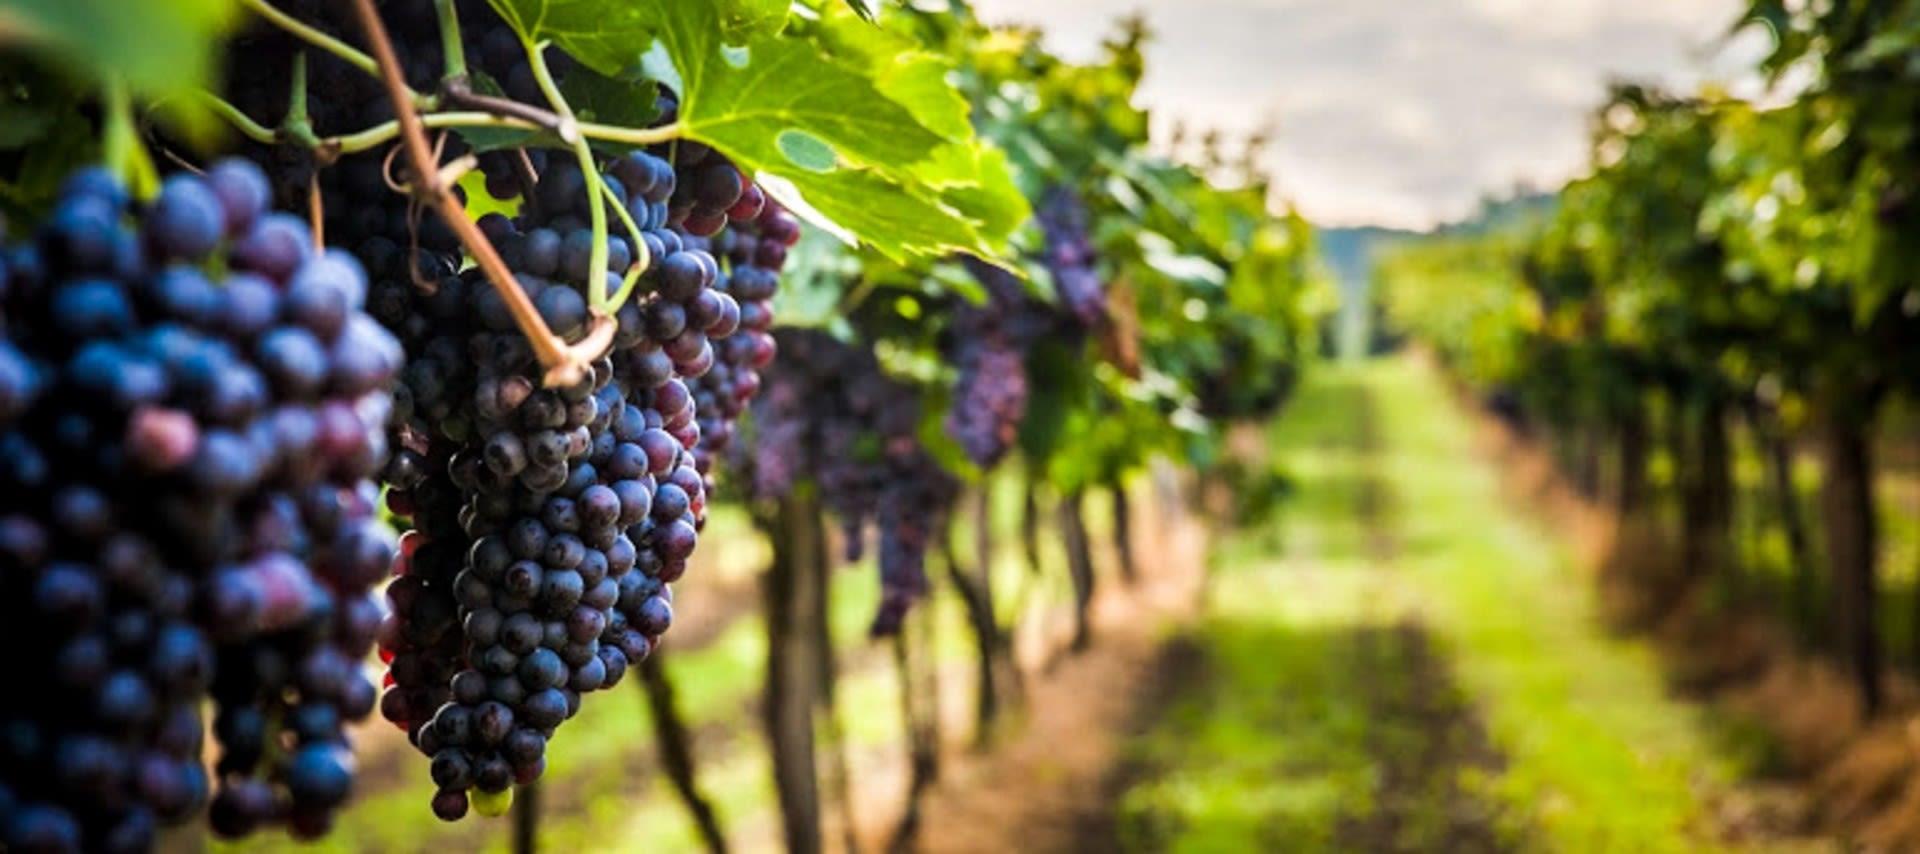 Grapes hanging in vineyard in Peru